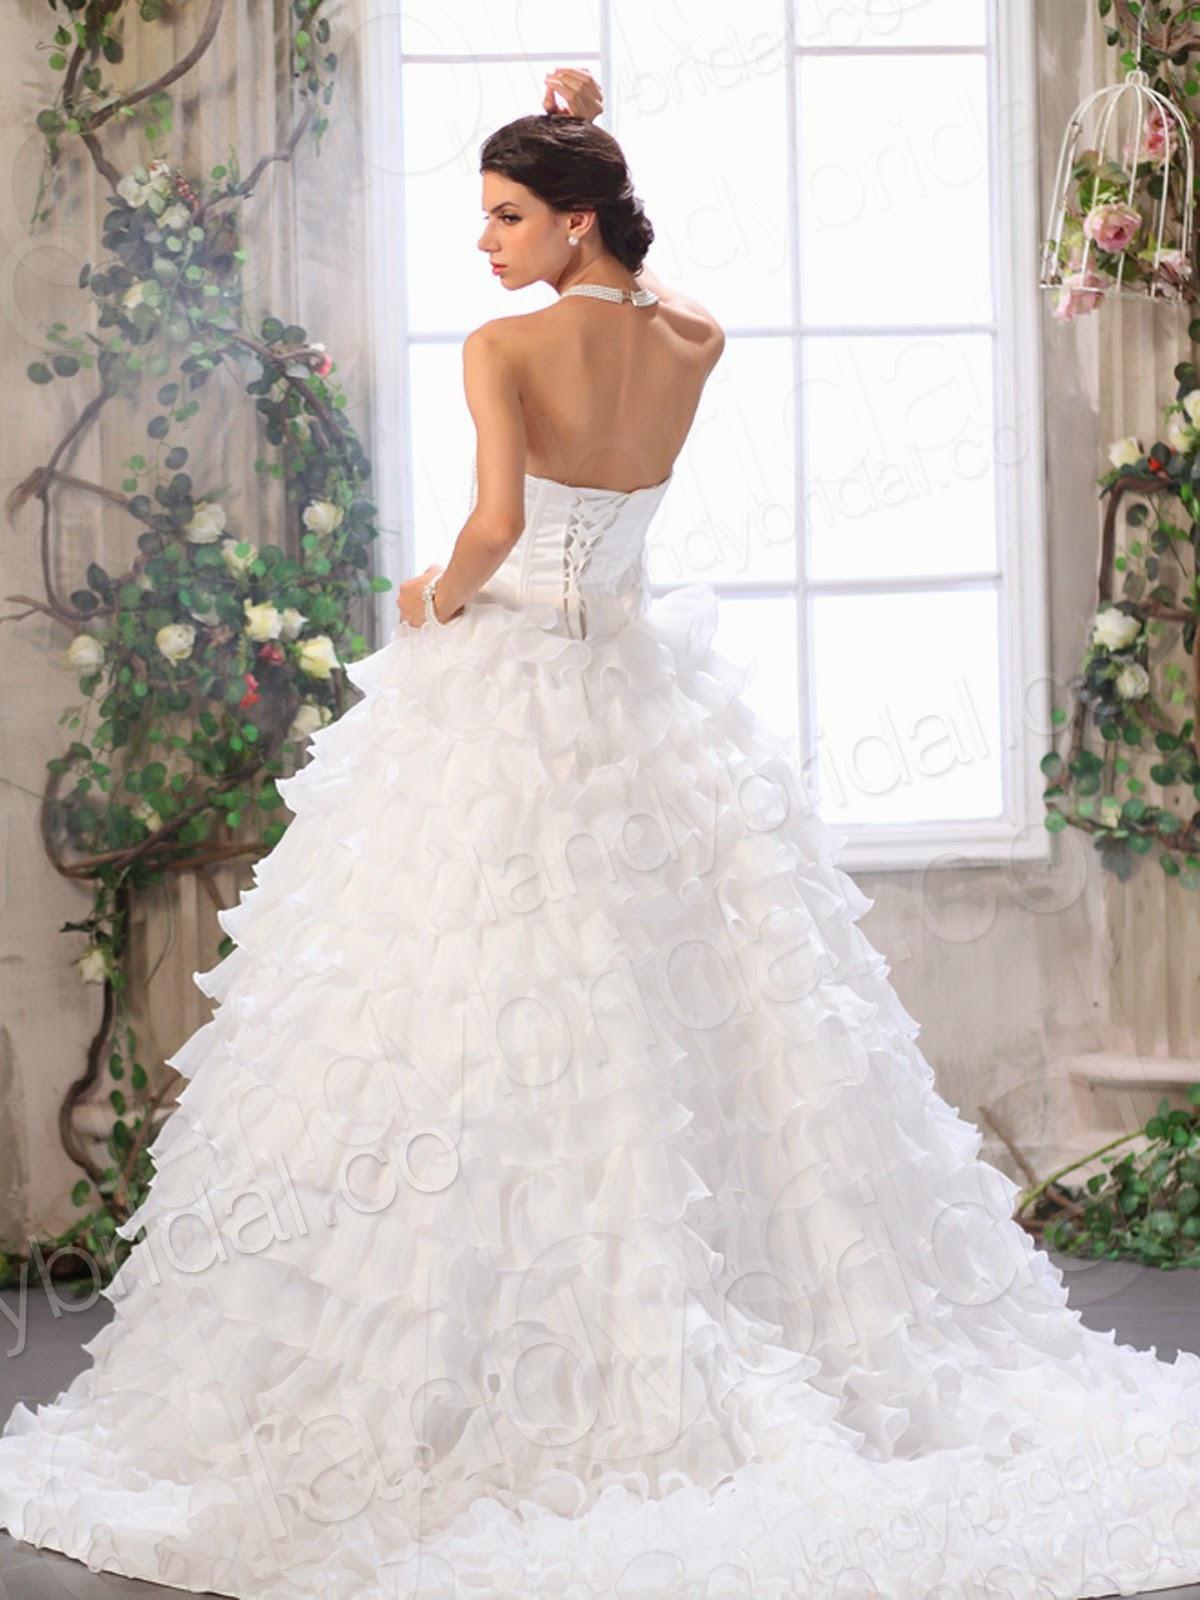 history of white wedding dresses white wedding dresses History Of White Wedding Dresses